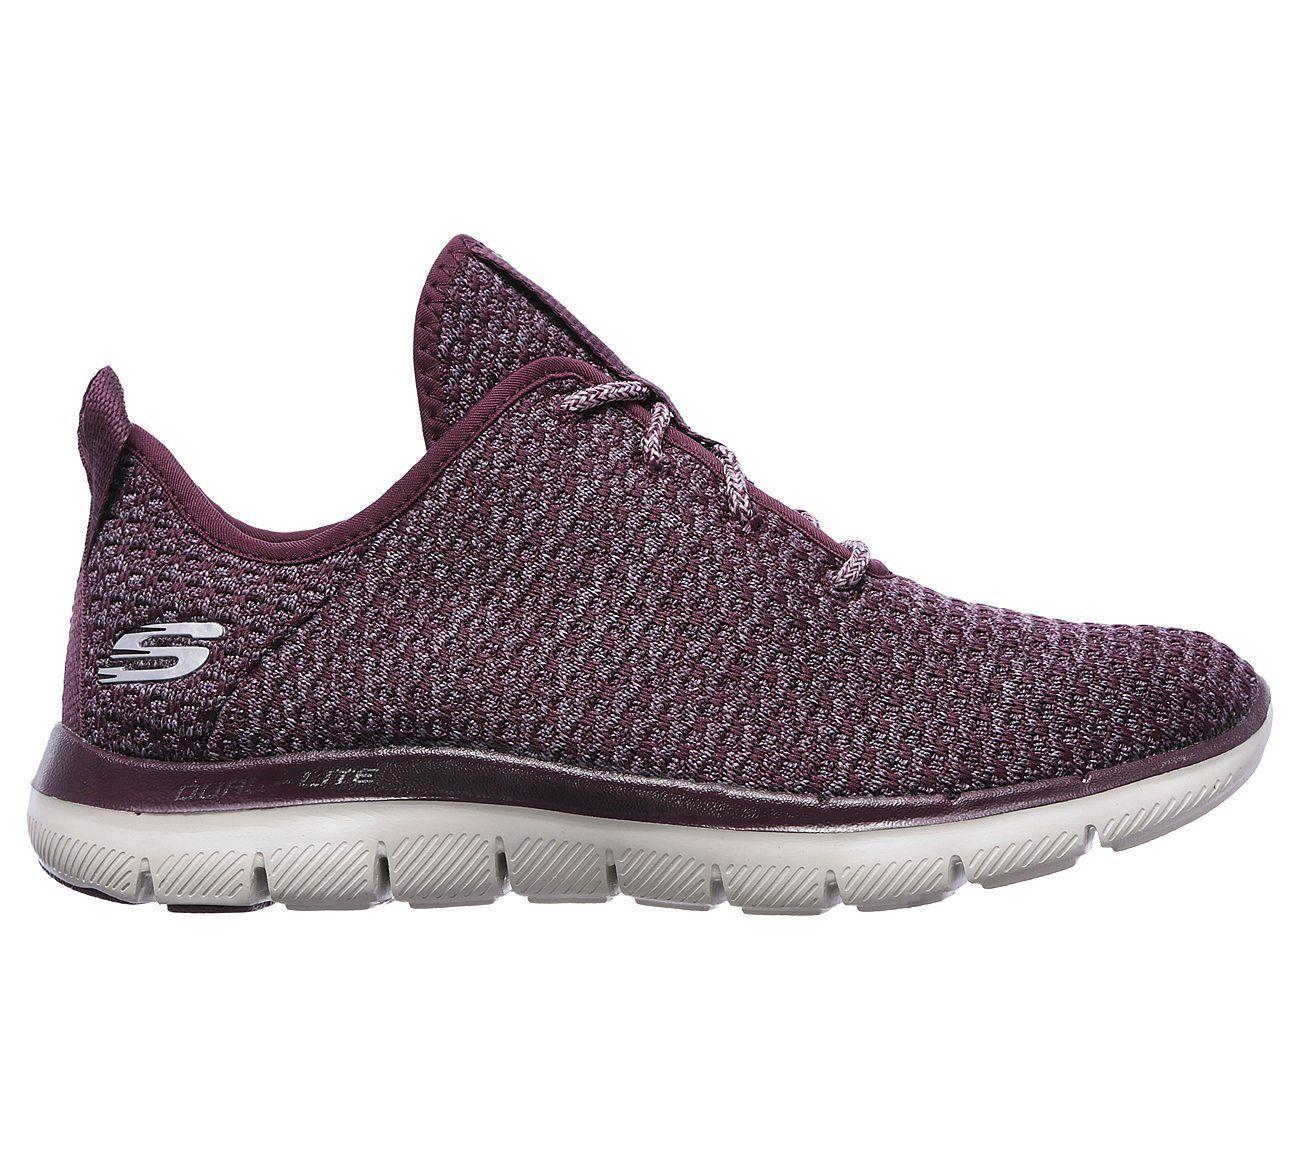 12773 Plum Skechers Shoes Memory Foam Women Slipon Comfort Casual